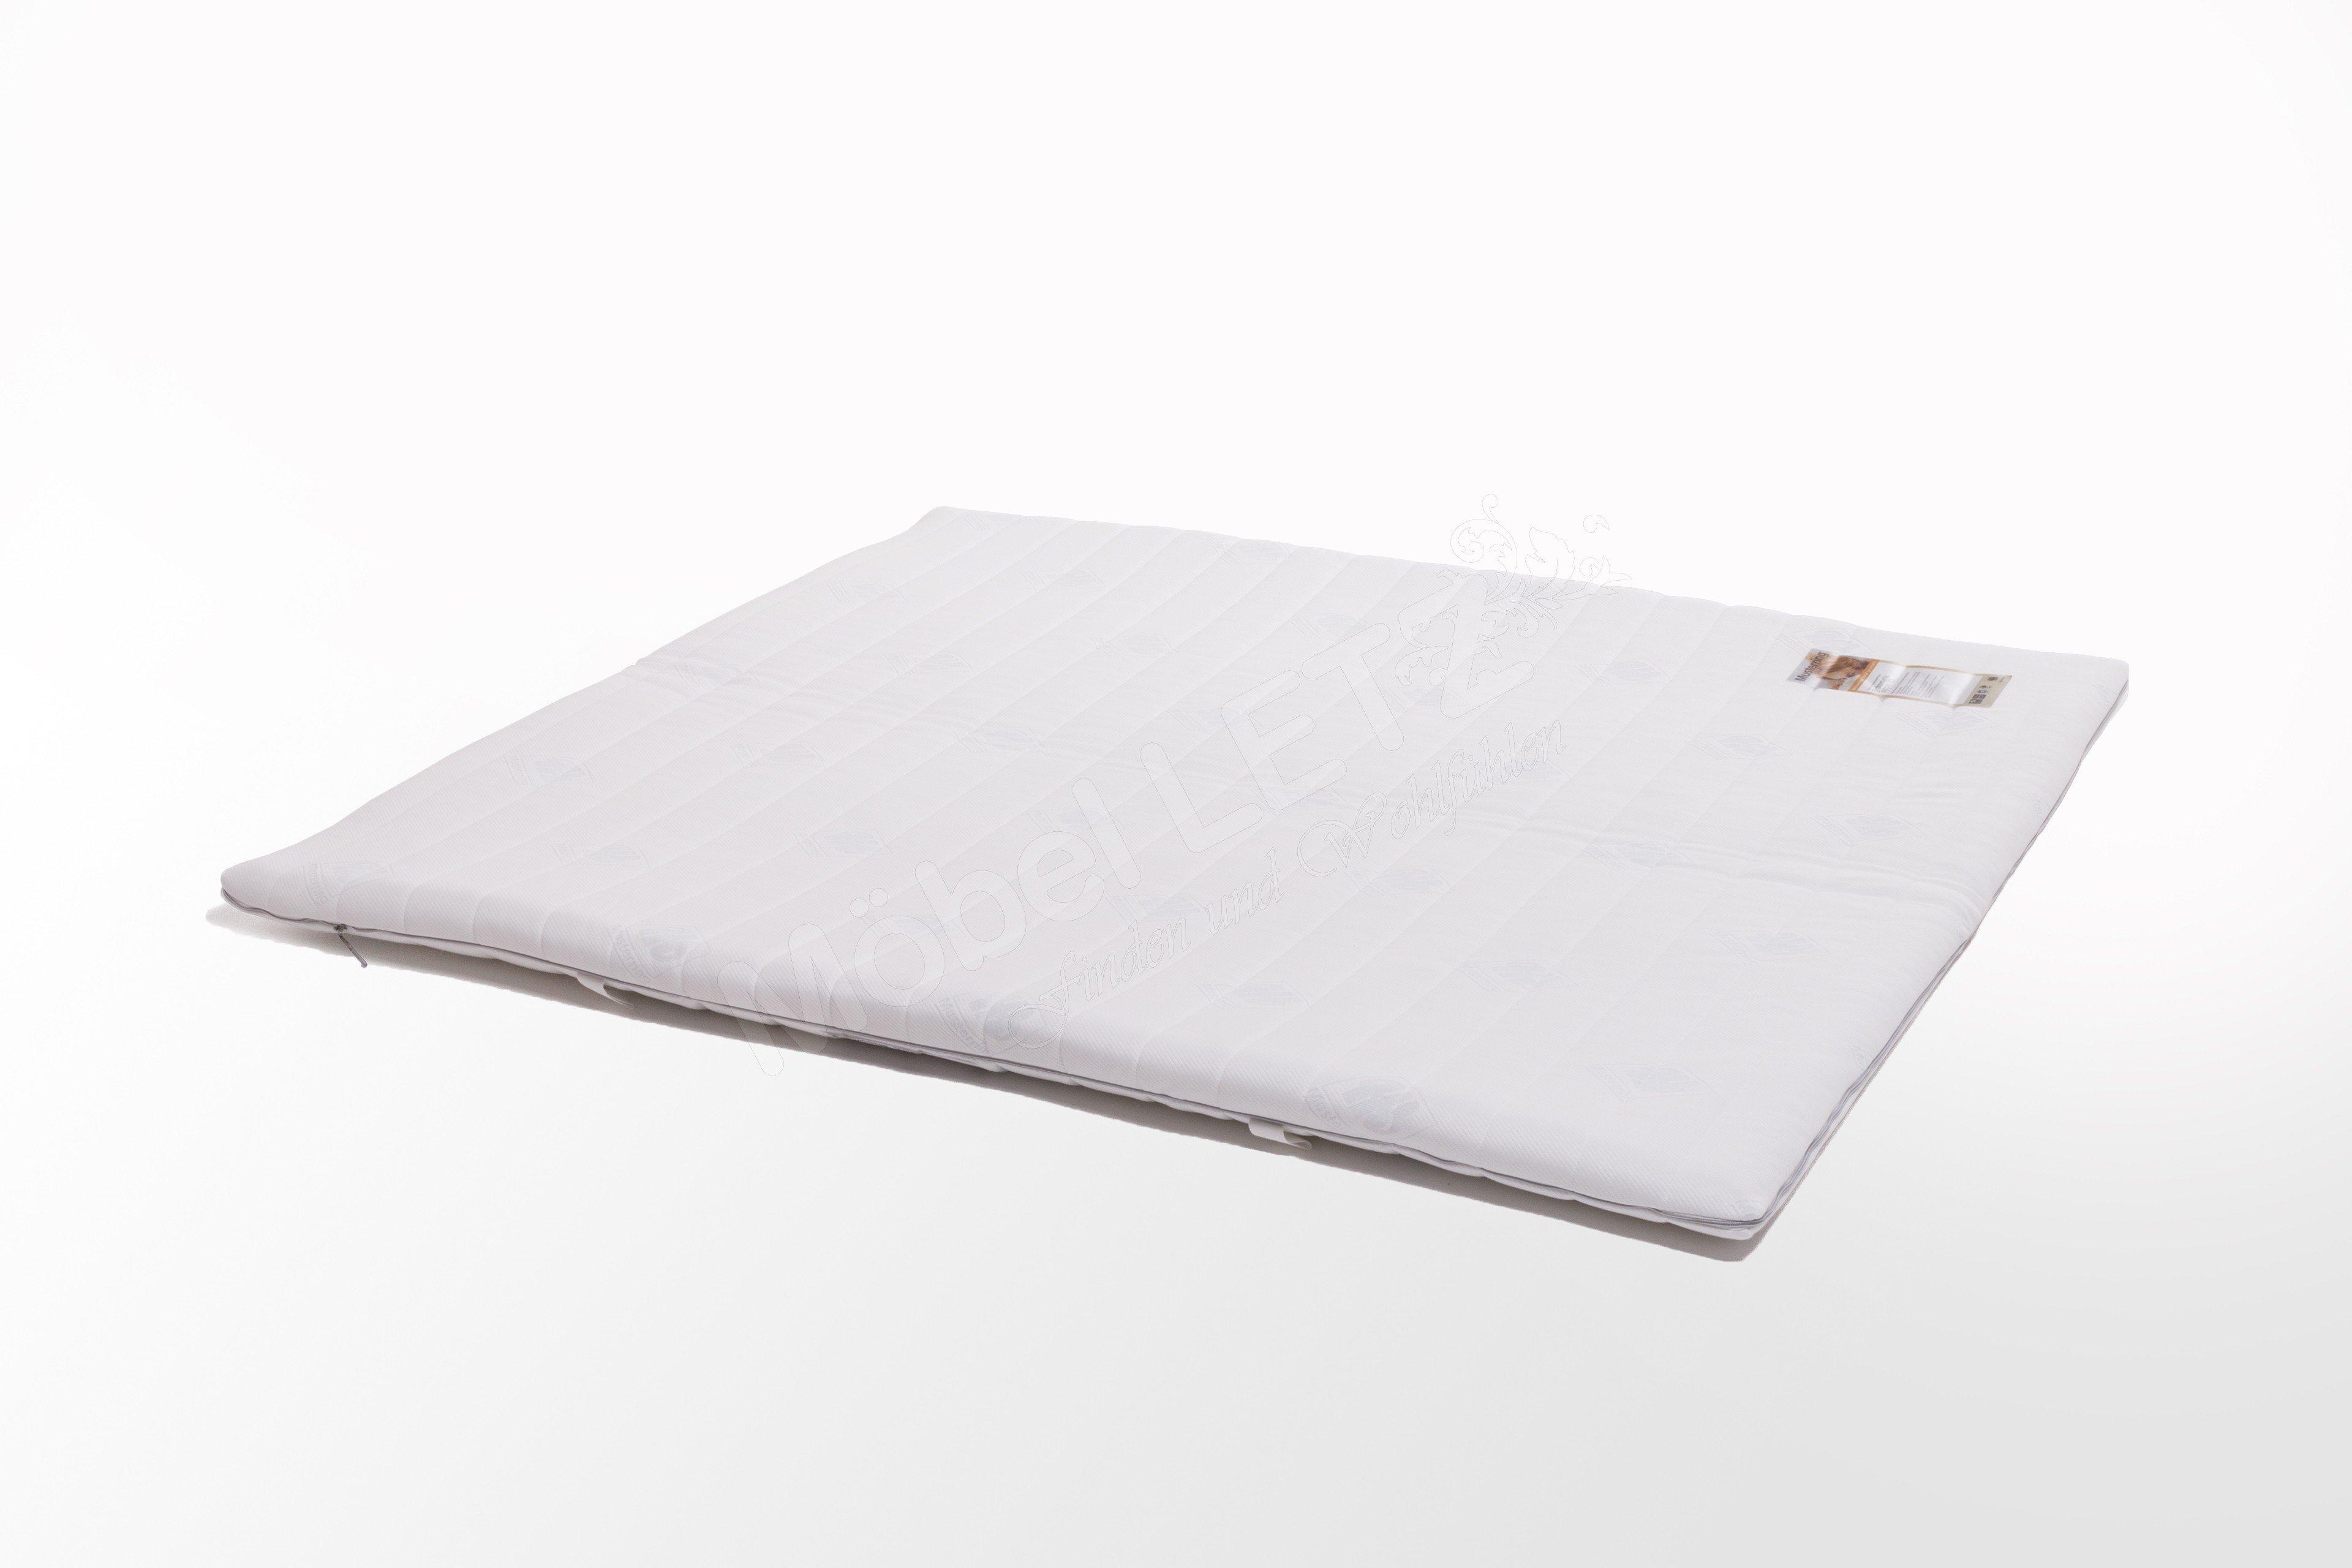 kollektion letz kaltschaum topper zedarro 180 x 200 cm m bel letz ihr online shop. Black Bedroom Furniture Sets. Home Design Ideas